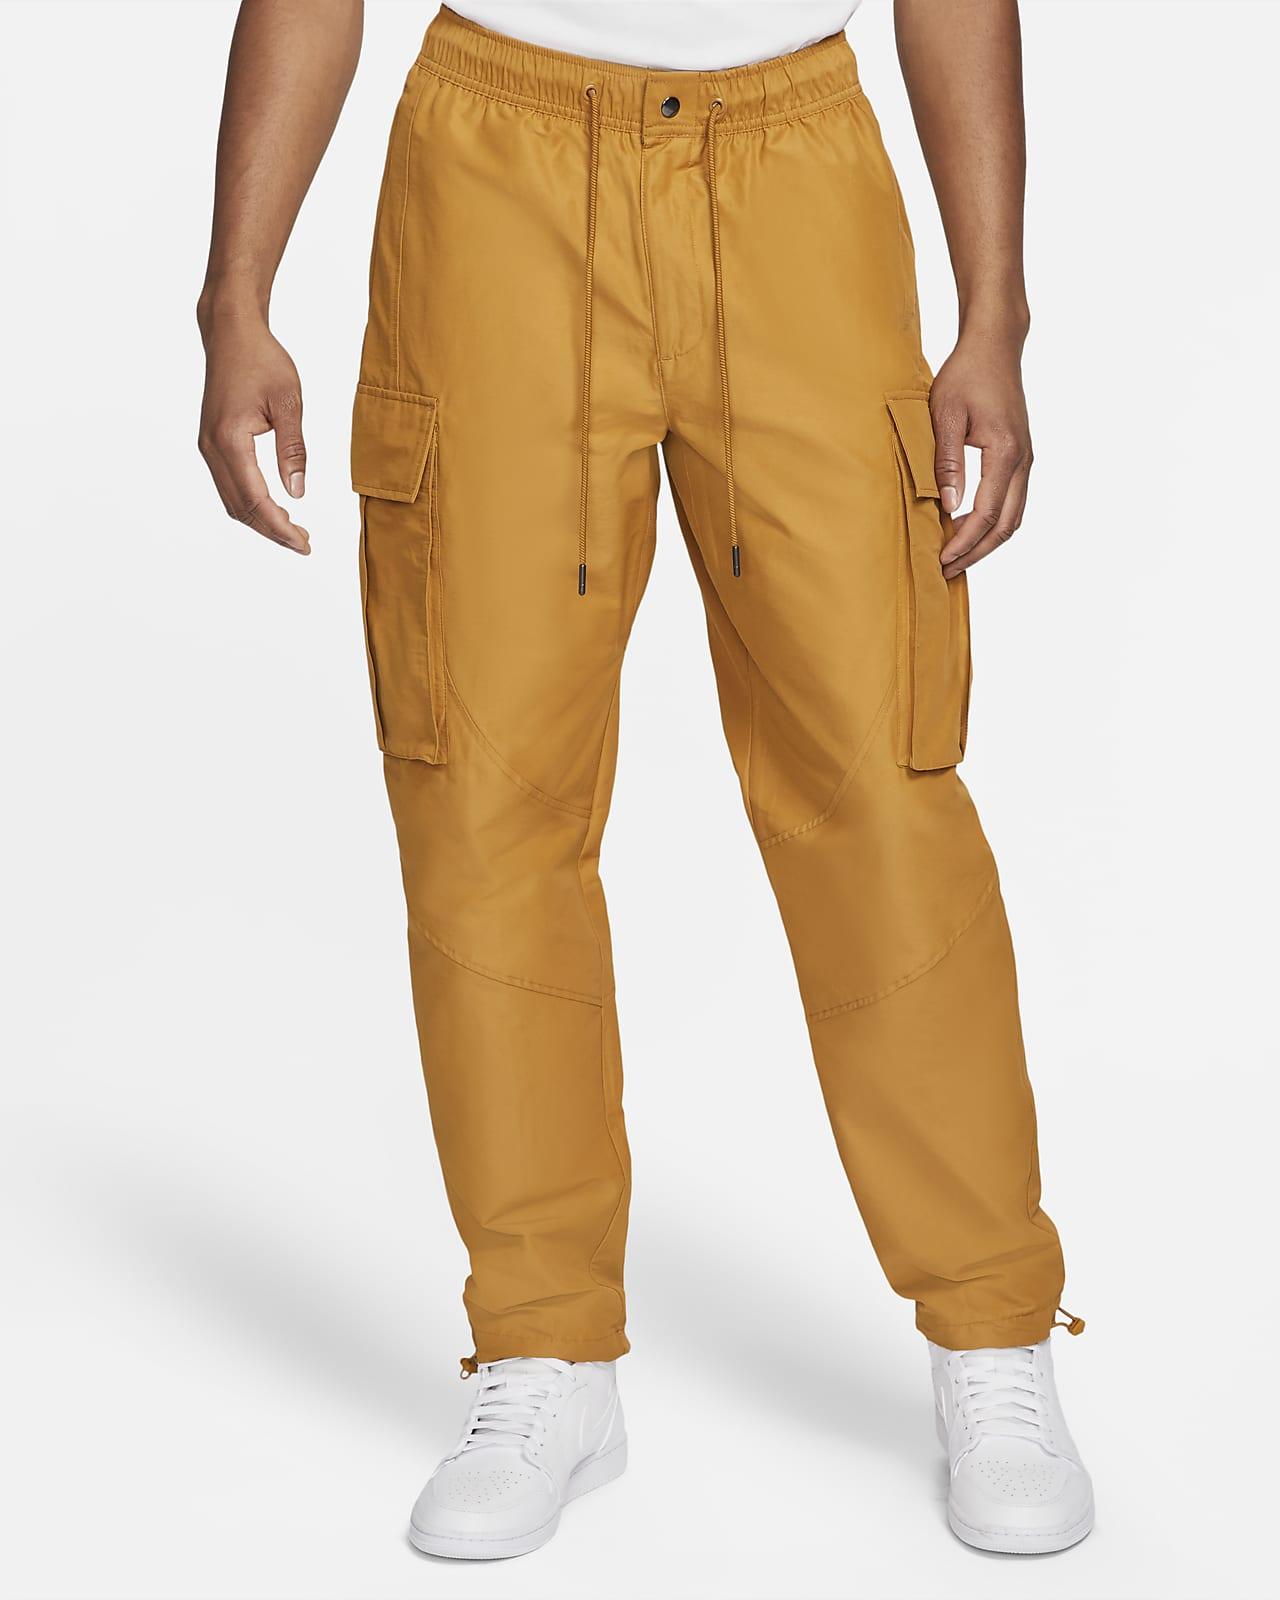 Jordan Flight Pantalons de teixit Woven - Home